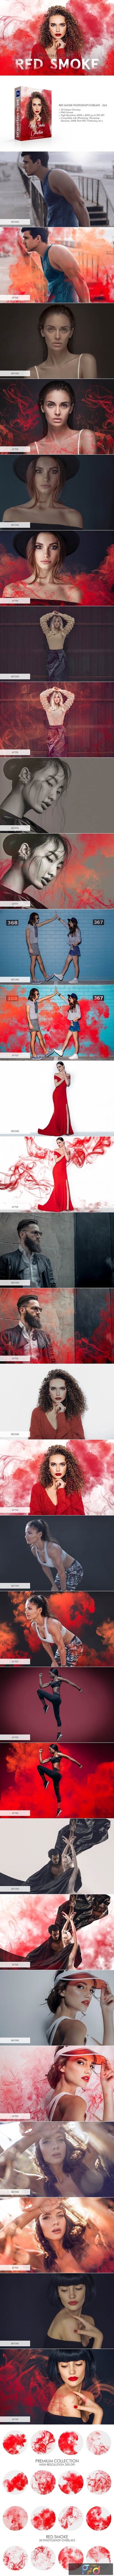 Red Smoke Photoshop Overlays 3894299 1